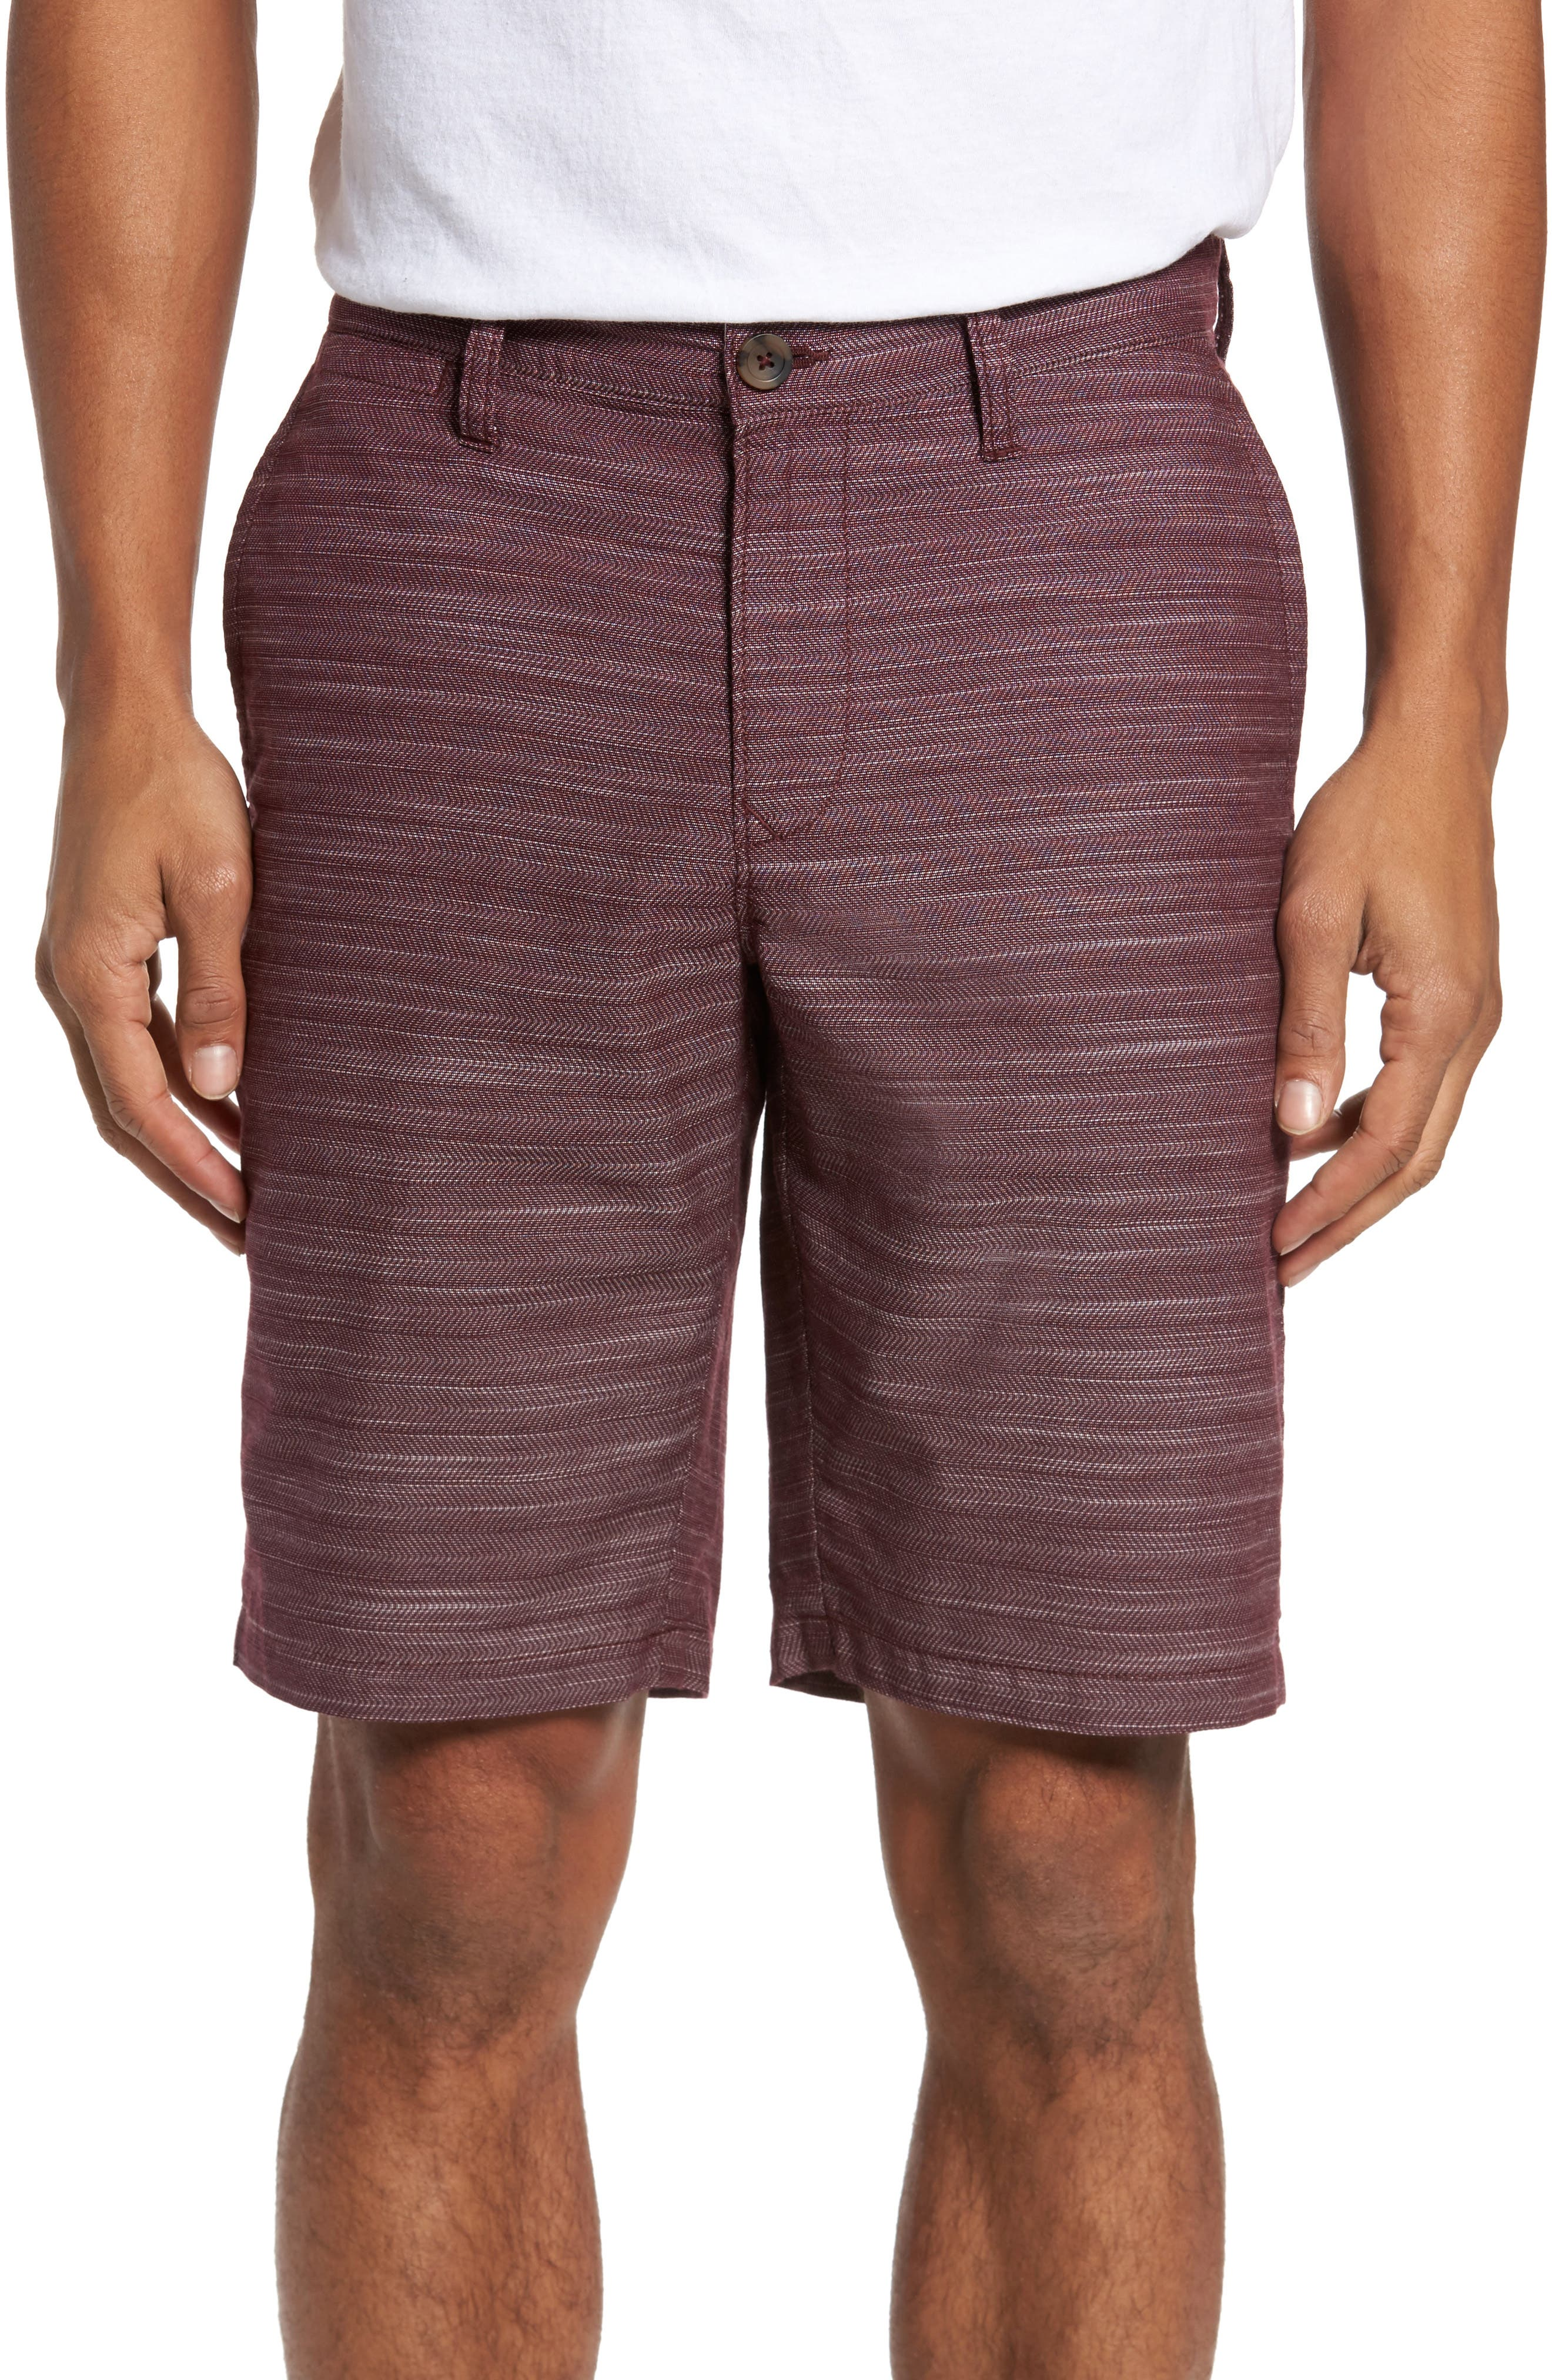 Herringbone Shorts,                             Main thumbnail 1, color,                             Burgundy Royale